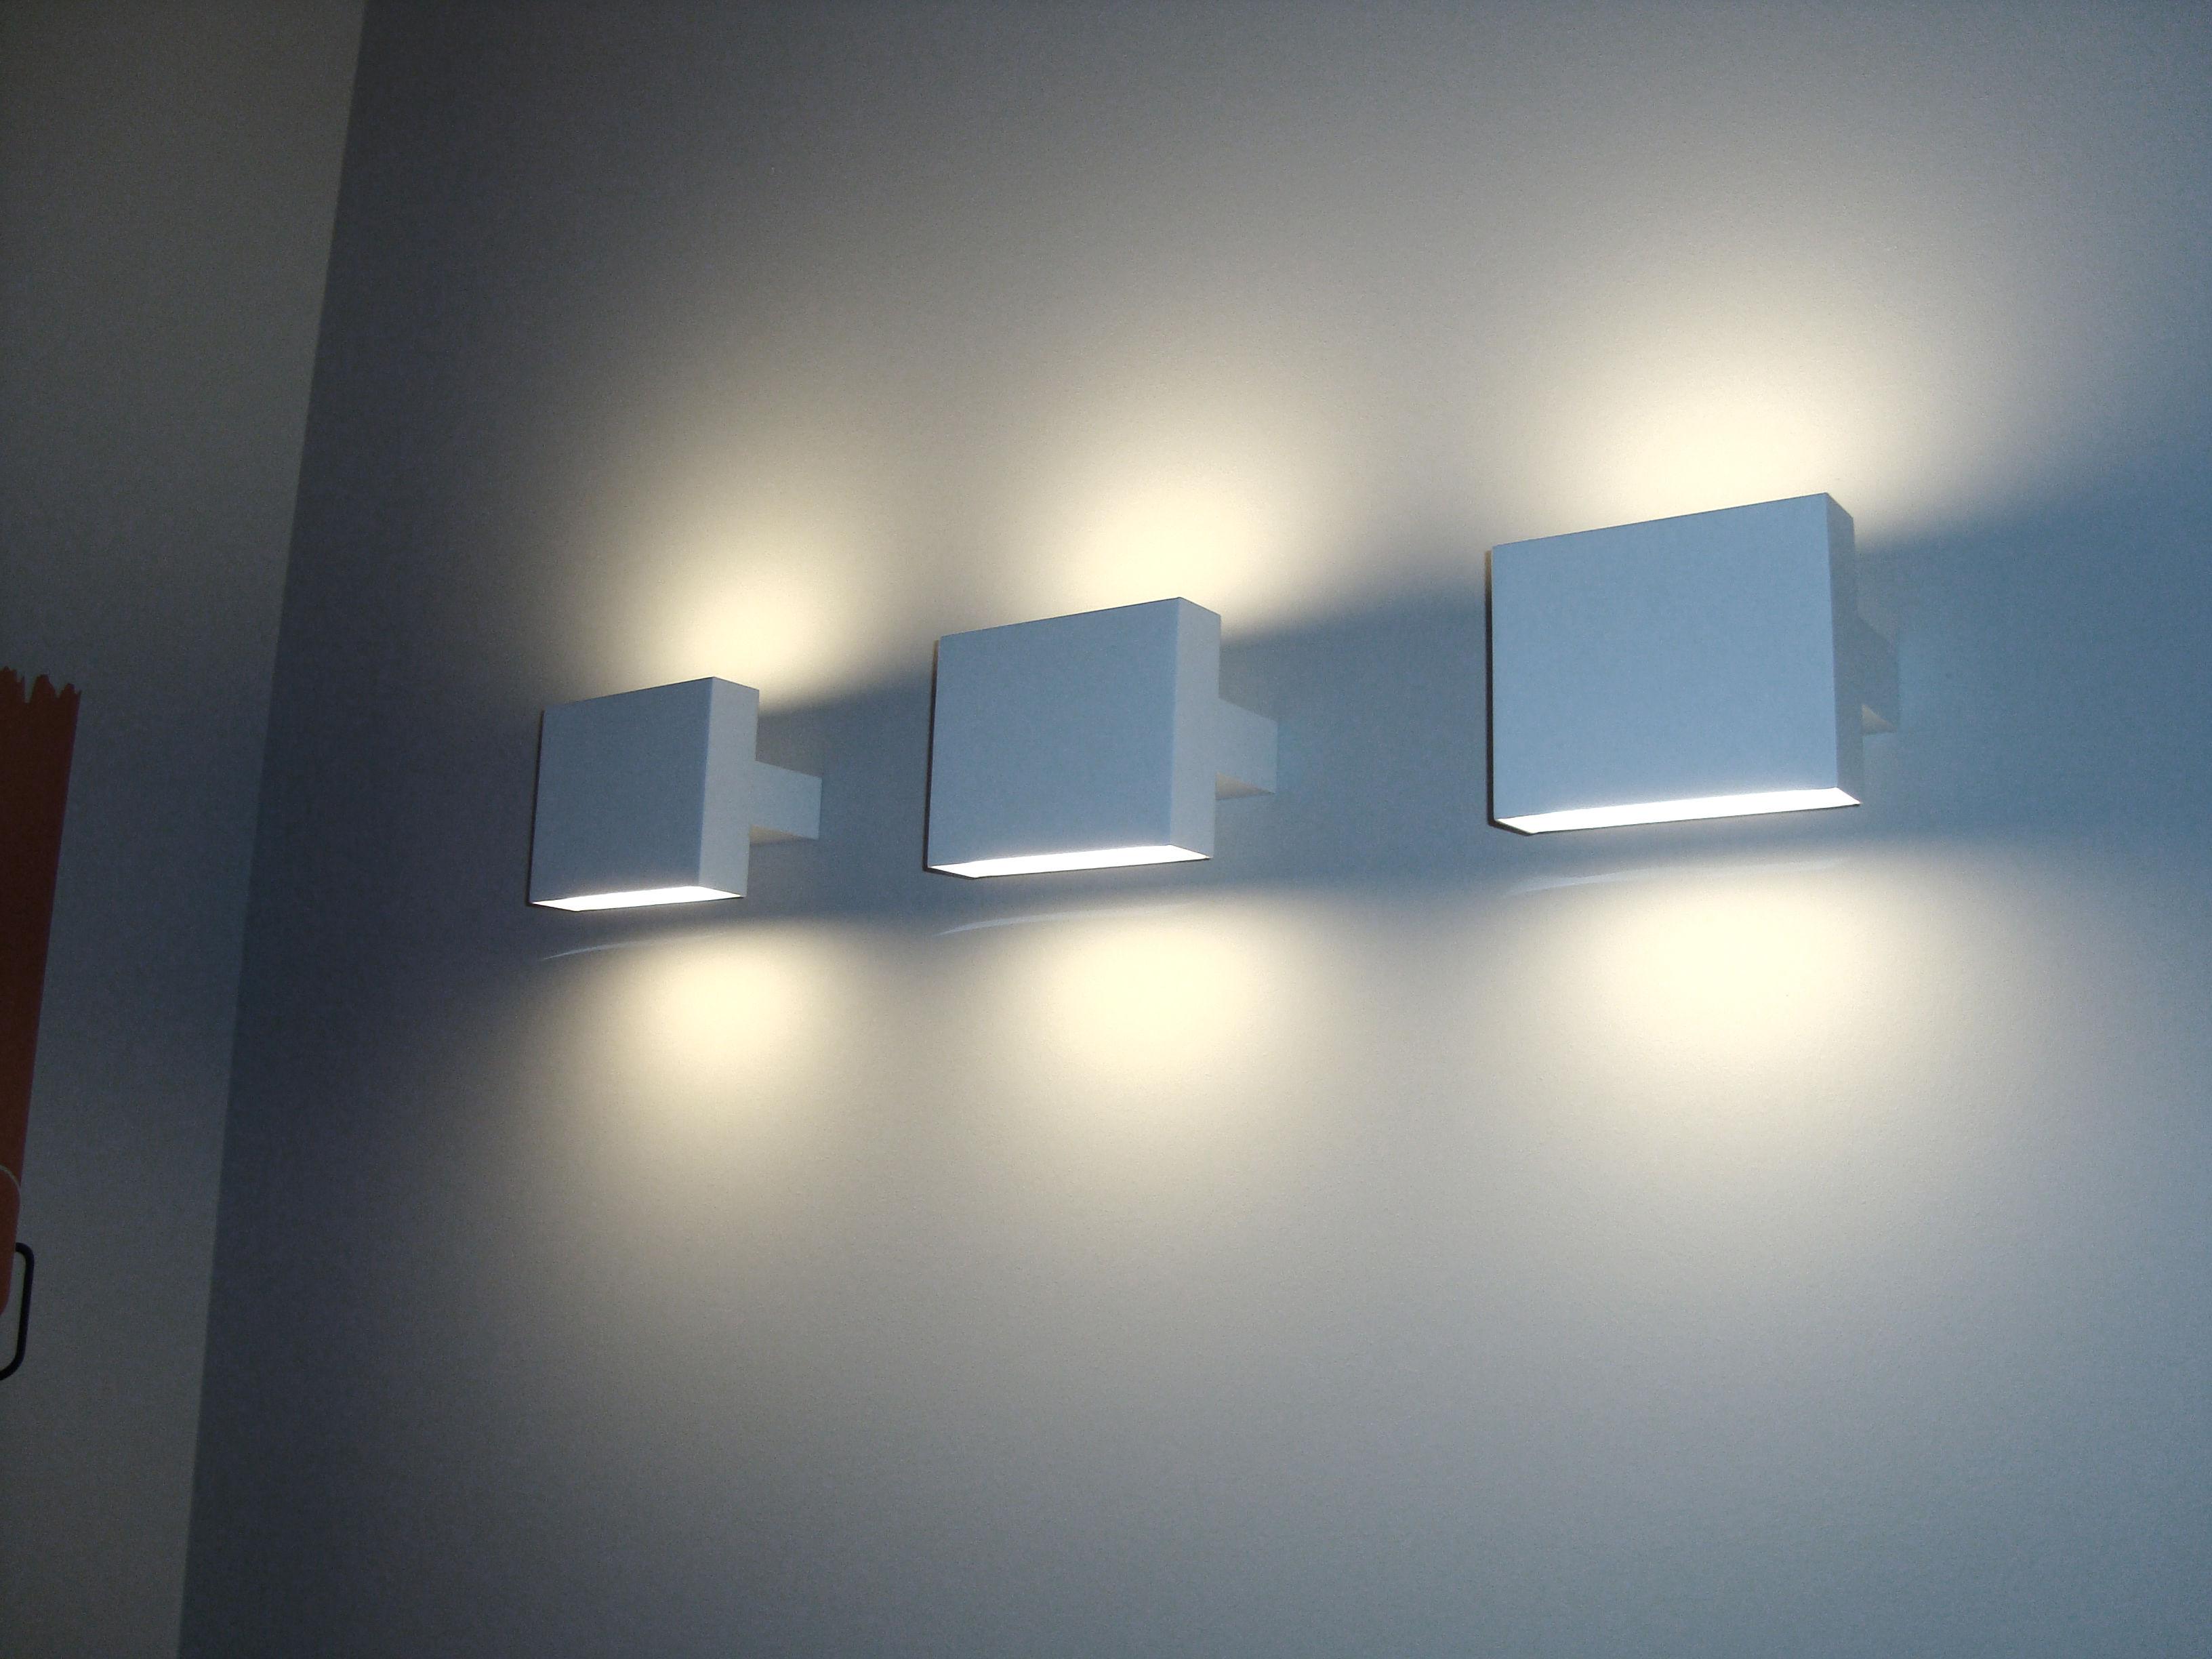 Flos wandleuchte: long light wandleuchte von flos bei m lichtdesign